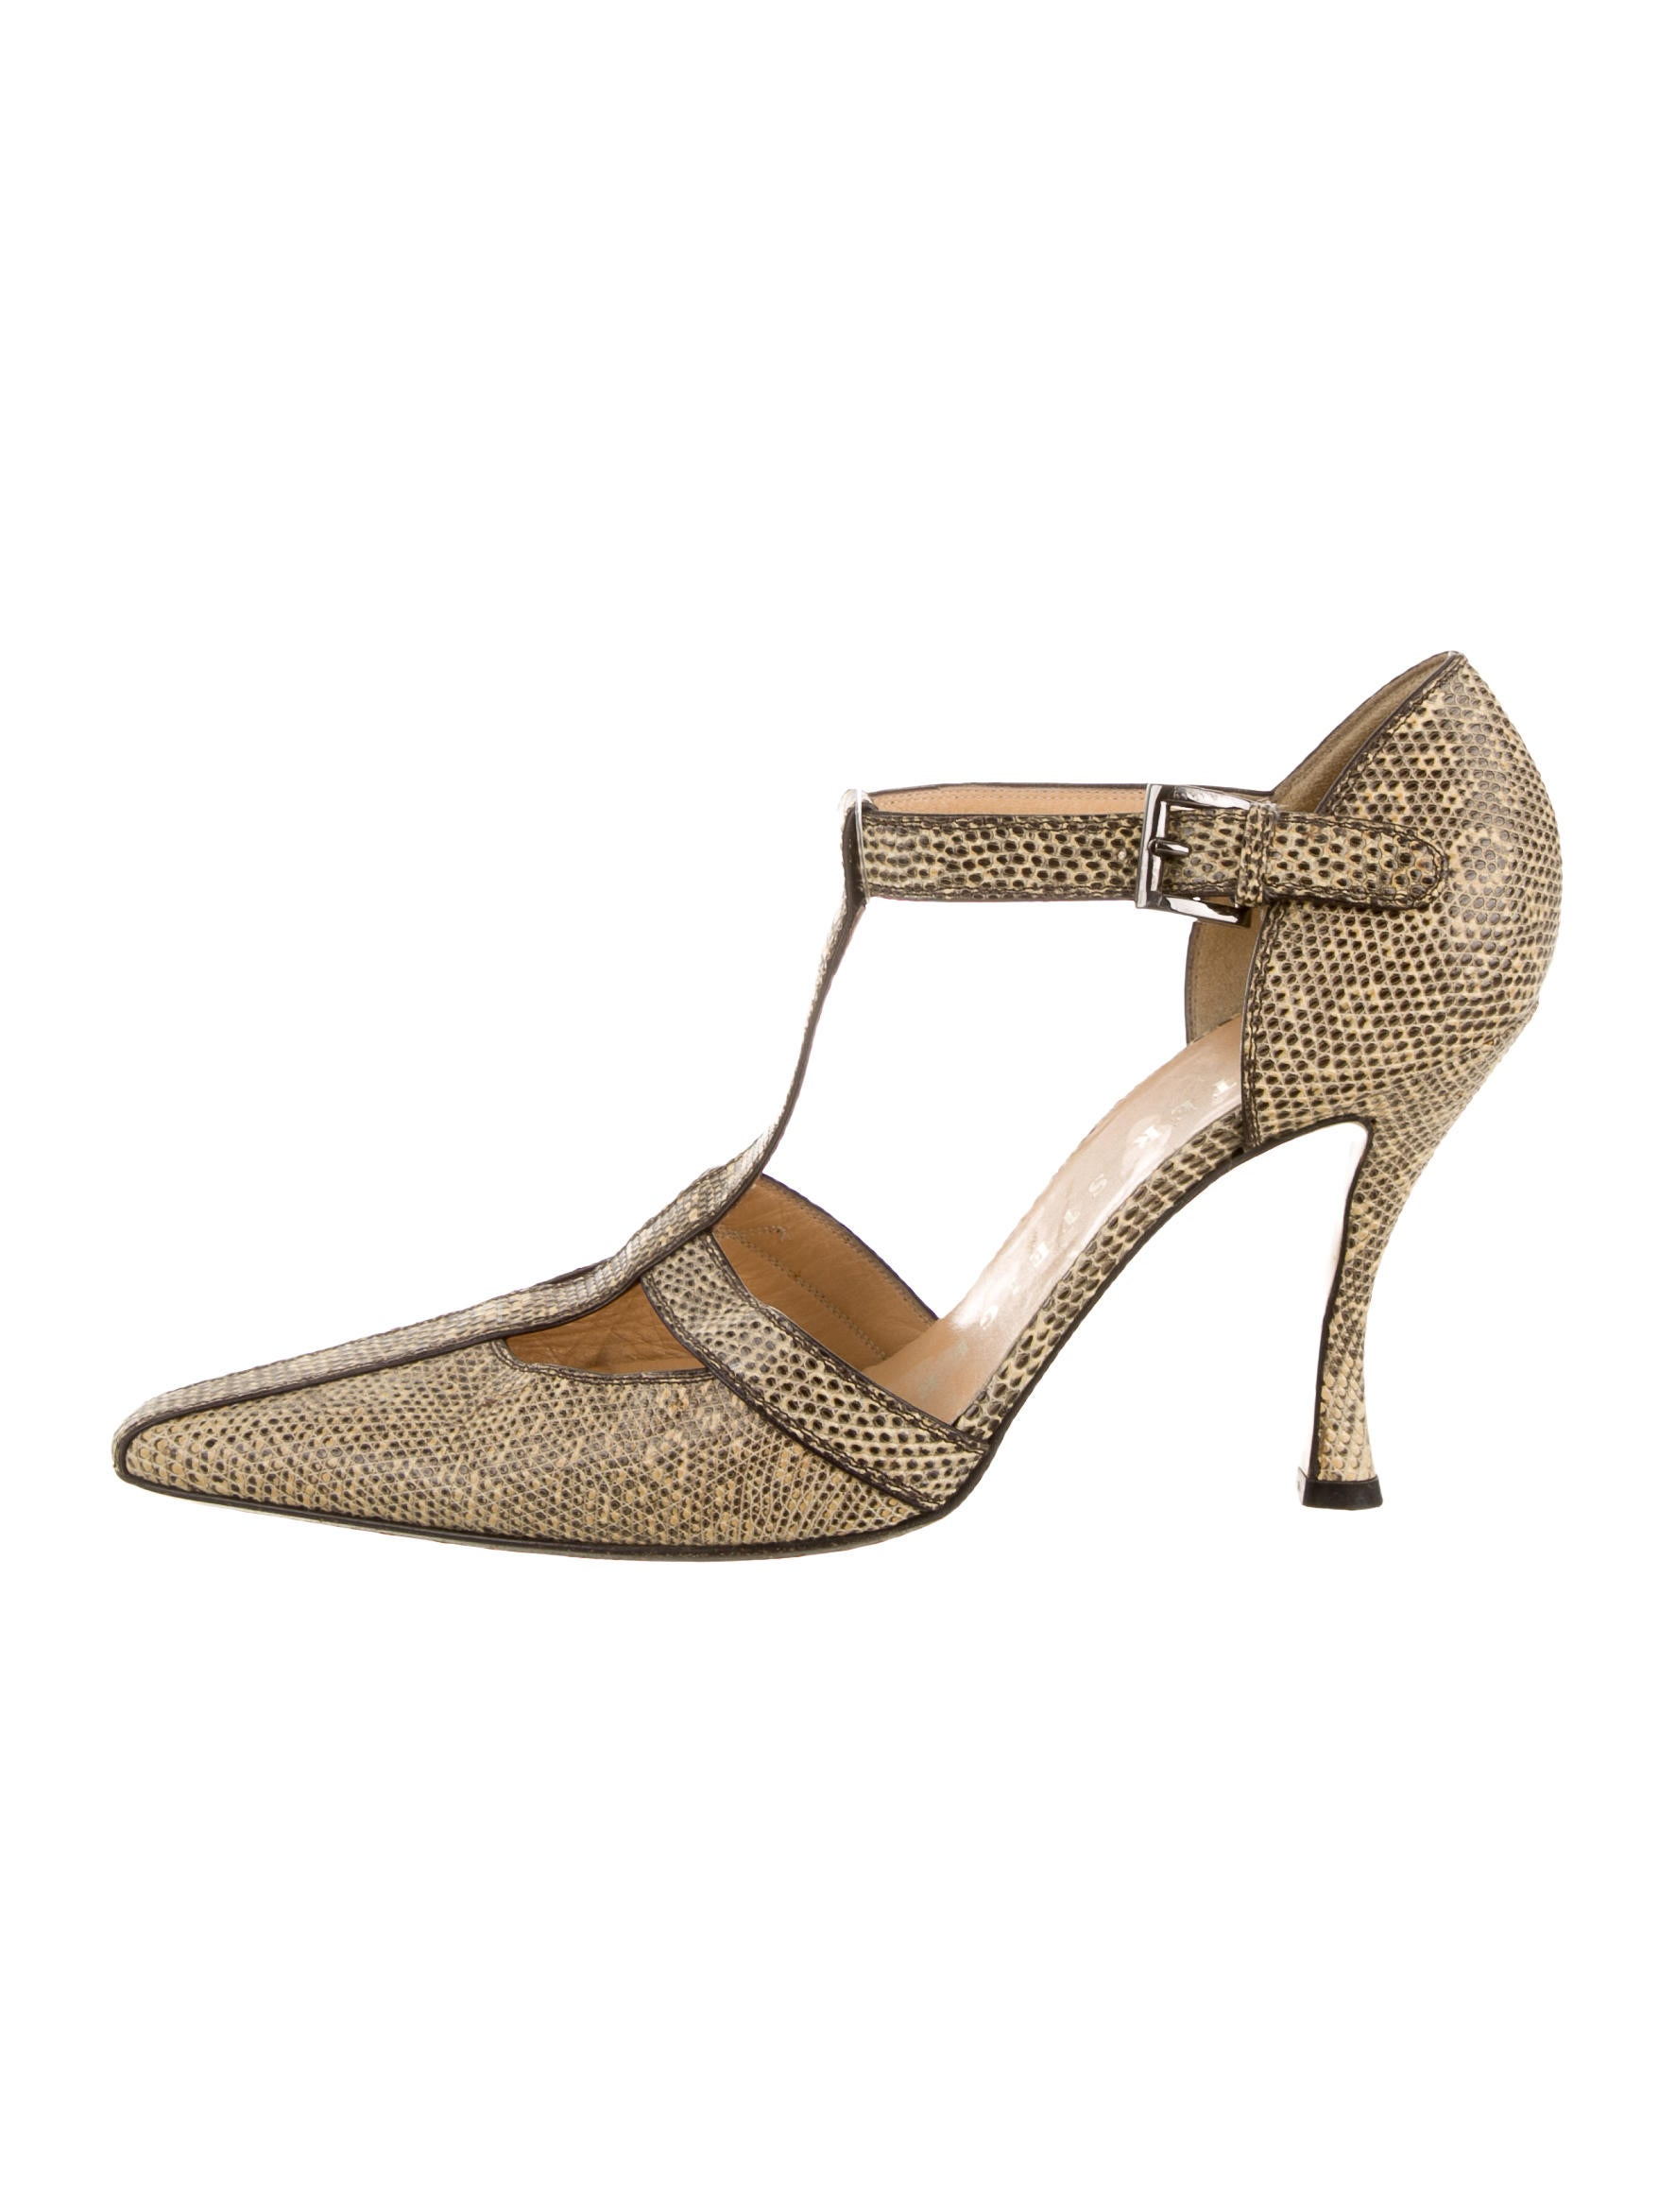 walter steiger lizard t strap pumps shoes sti20384 the realreal. Black Bedroom Furniture Sets. Home Design Ideas